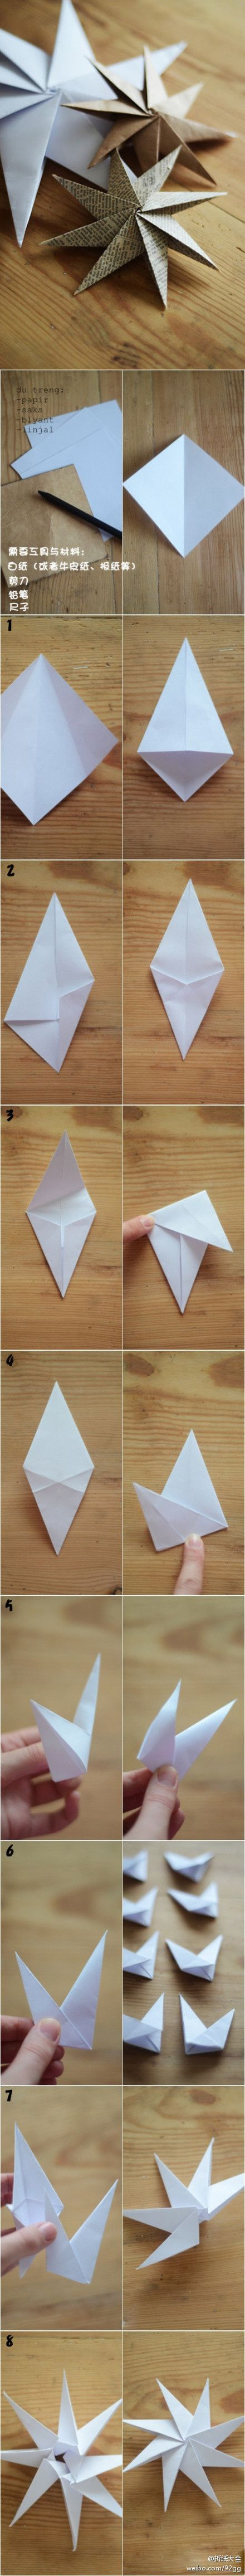 star origami (par assemblage)